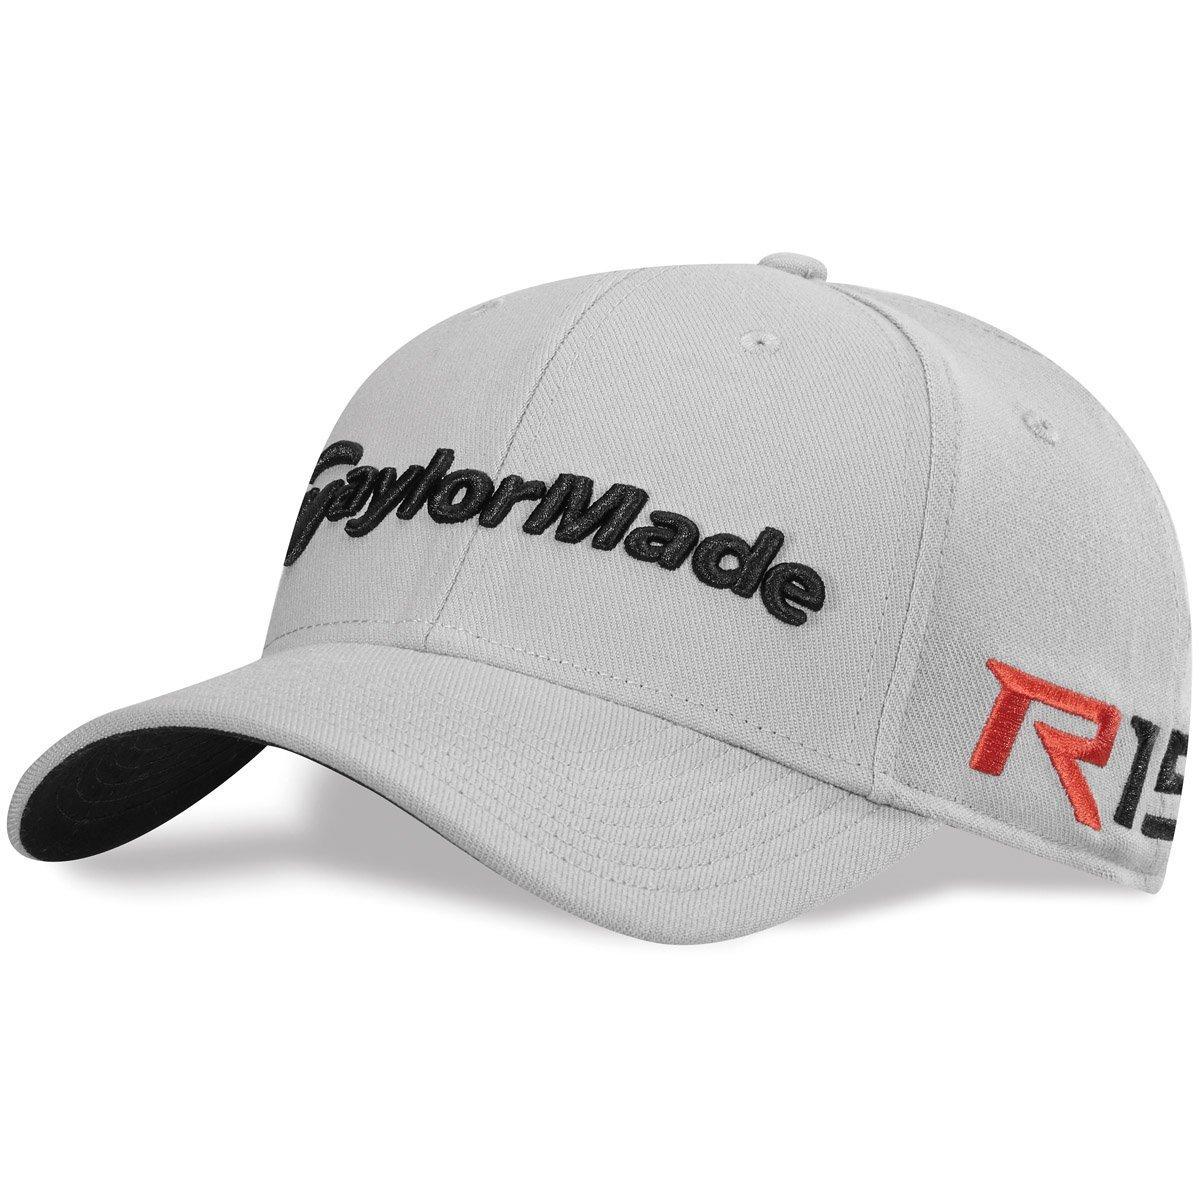 Amazon.com   2015 TaylorMade R15 39Thirty Stretch Fit Mens Golf Cap Grey    Sports   Outdoors 18cf31c5c2c1